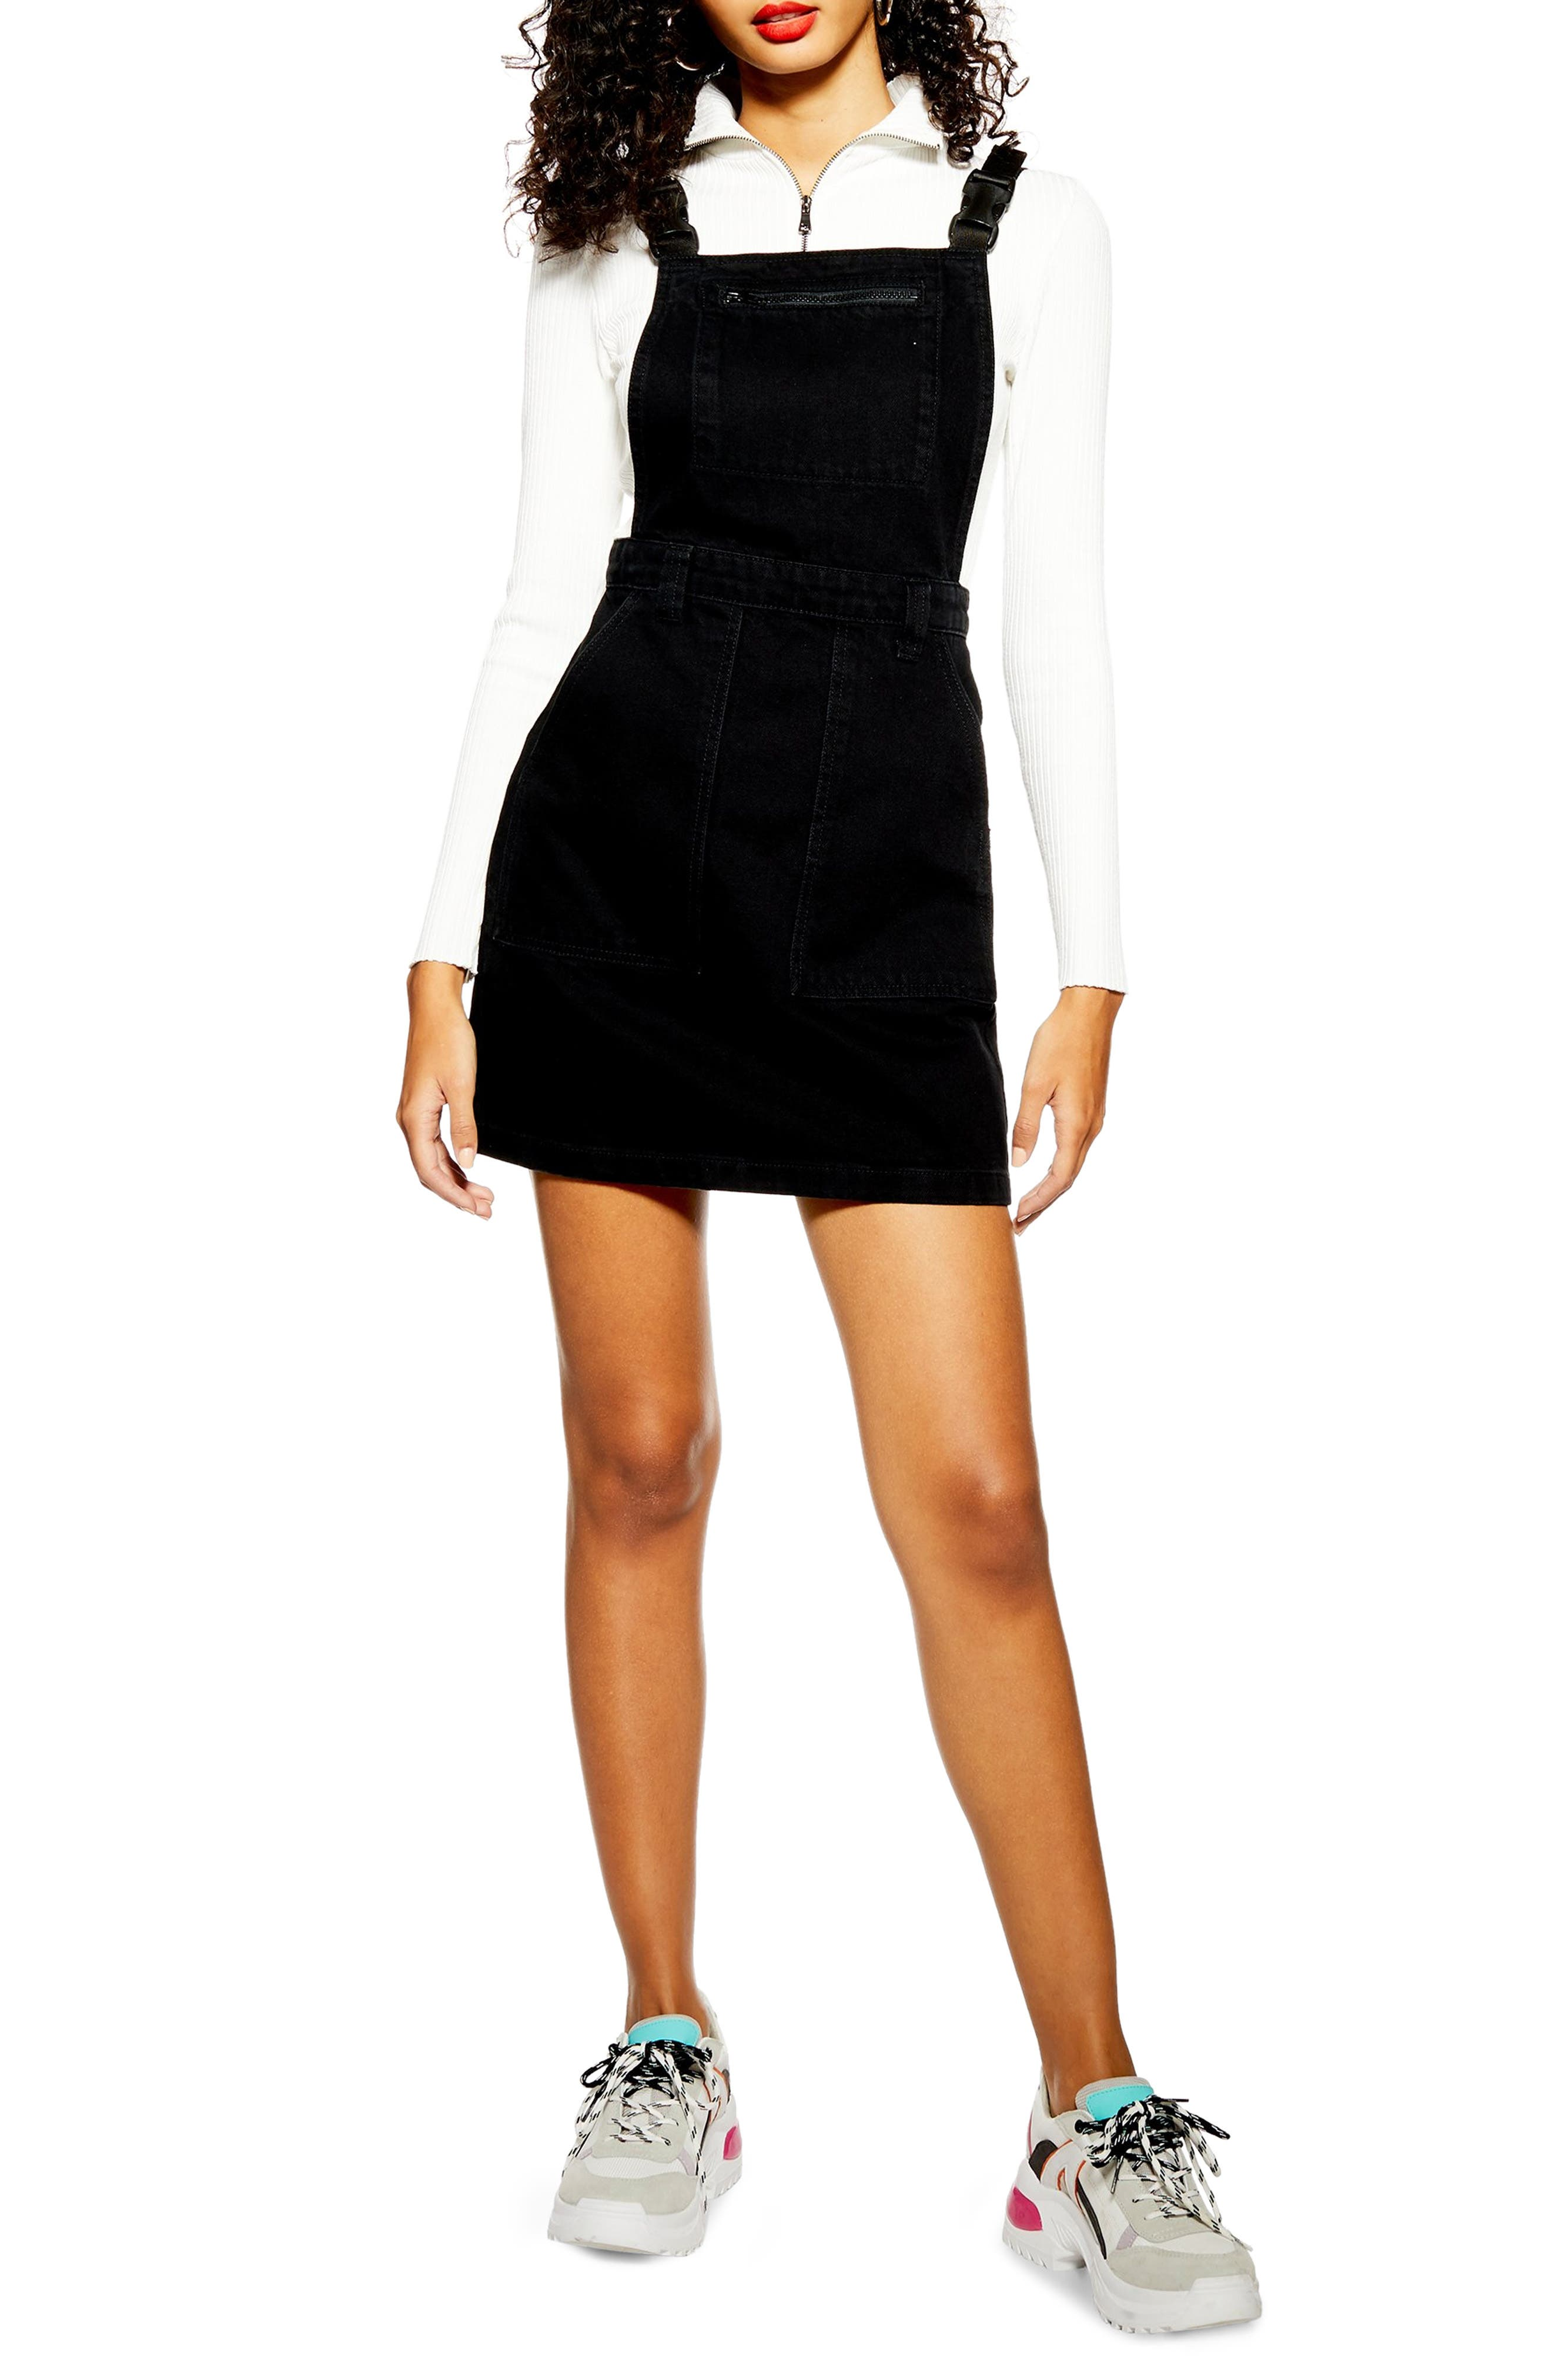 Topshop Pinafore Dress, US (fits like 0) - Black